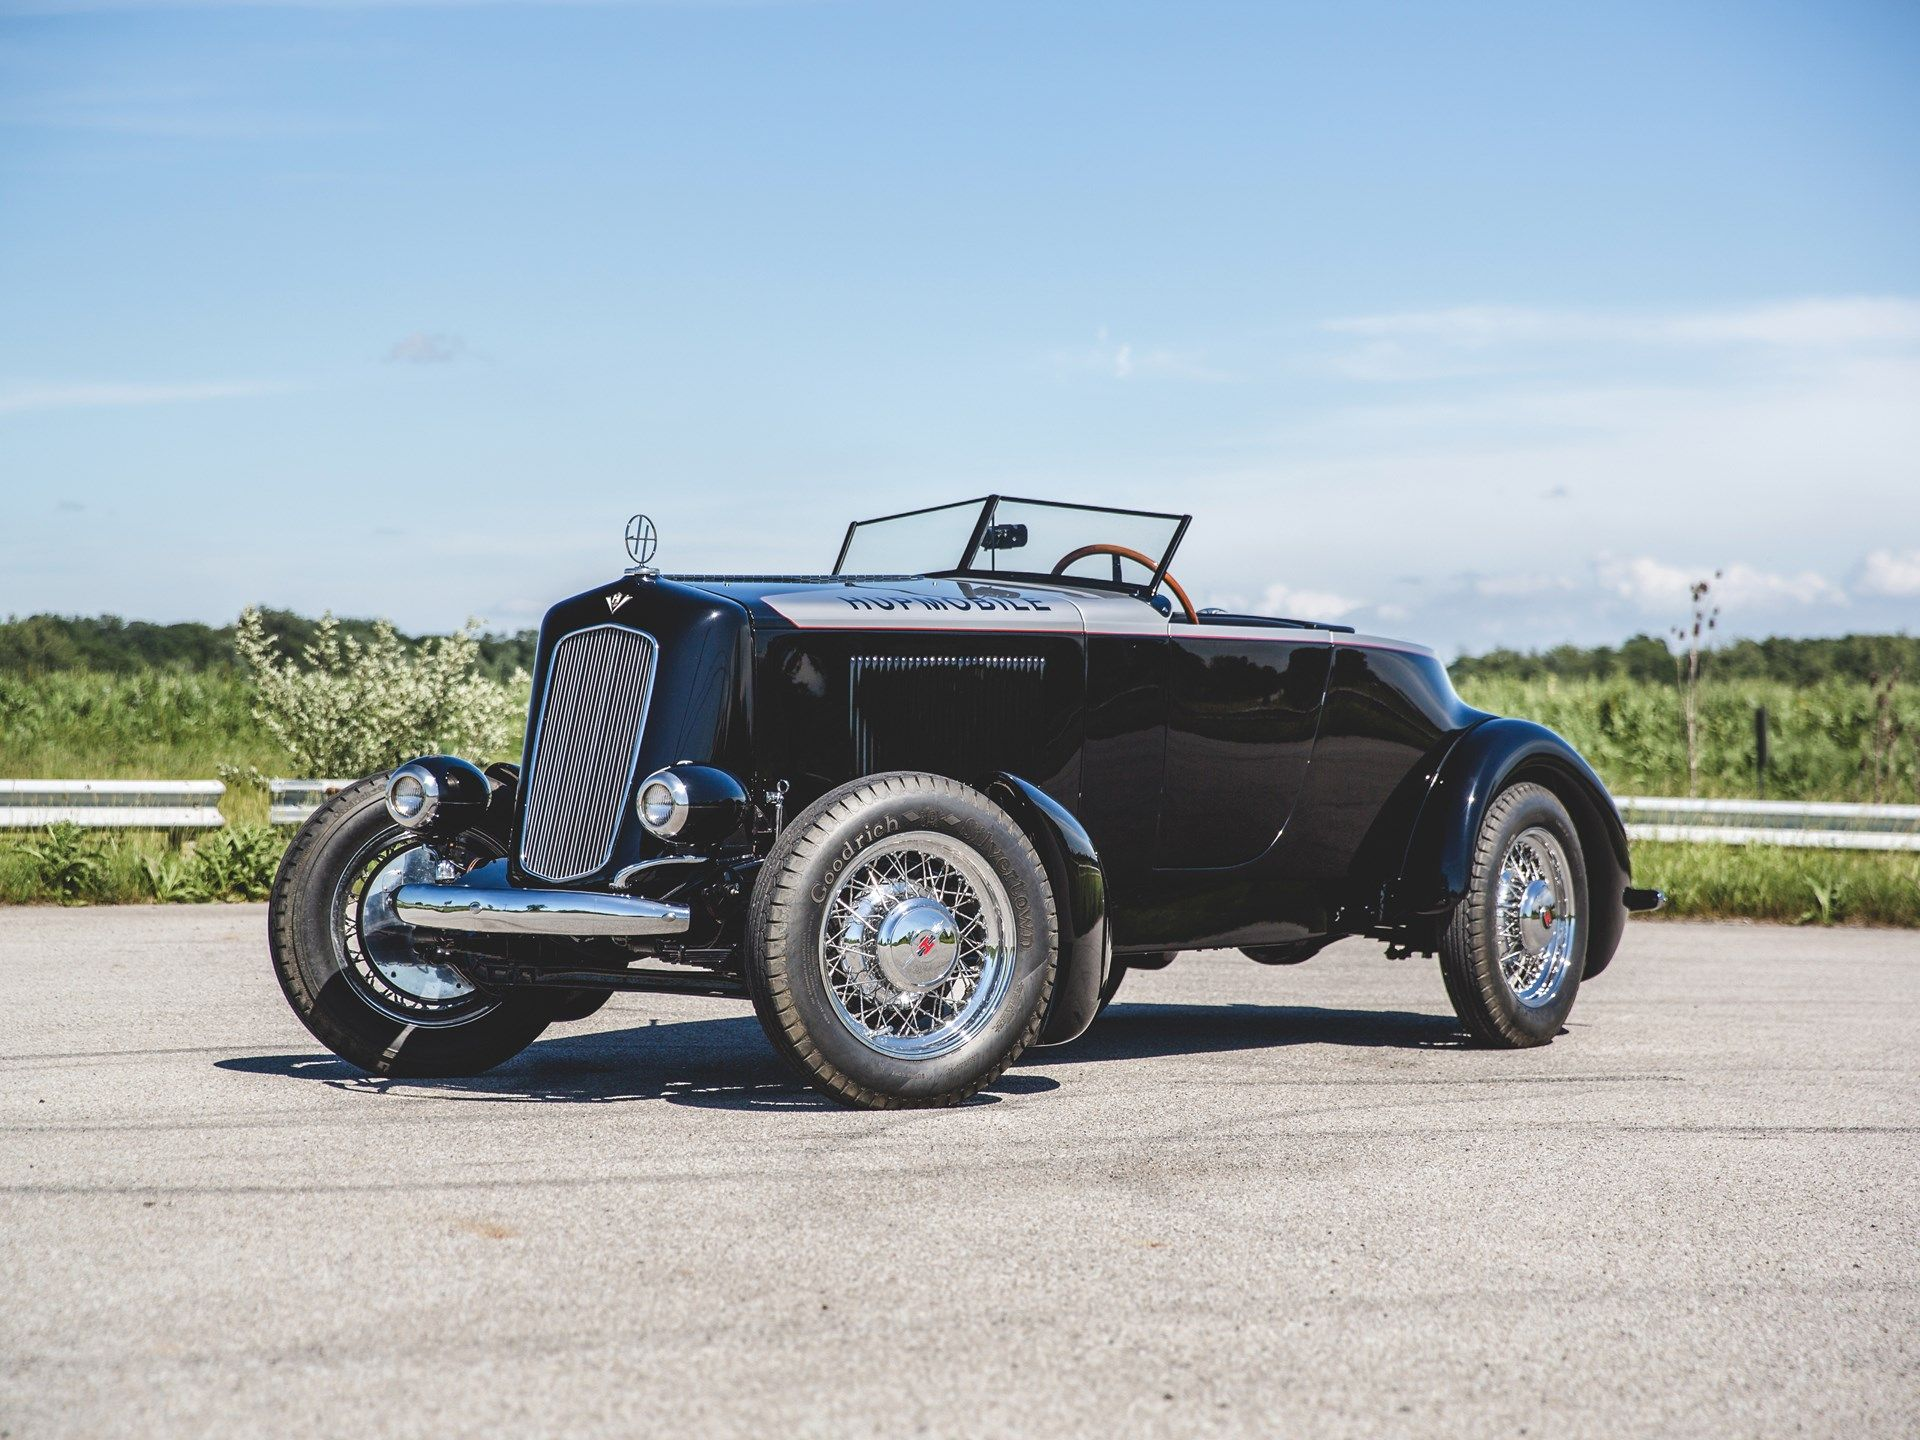 1930 Hupmobile Bonneville Speedster Cars For Sale Classic Cars Cars